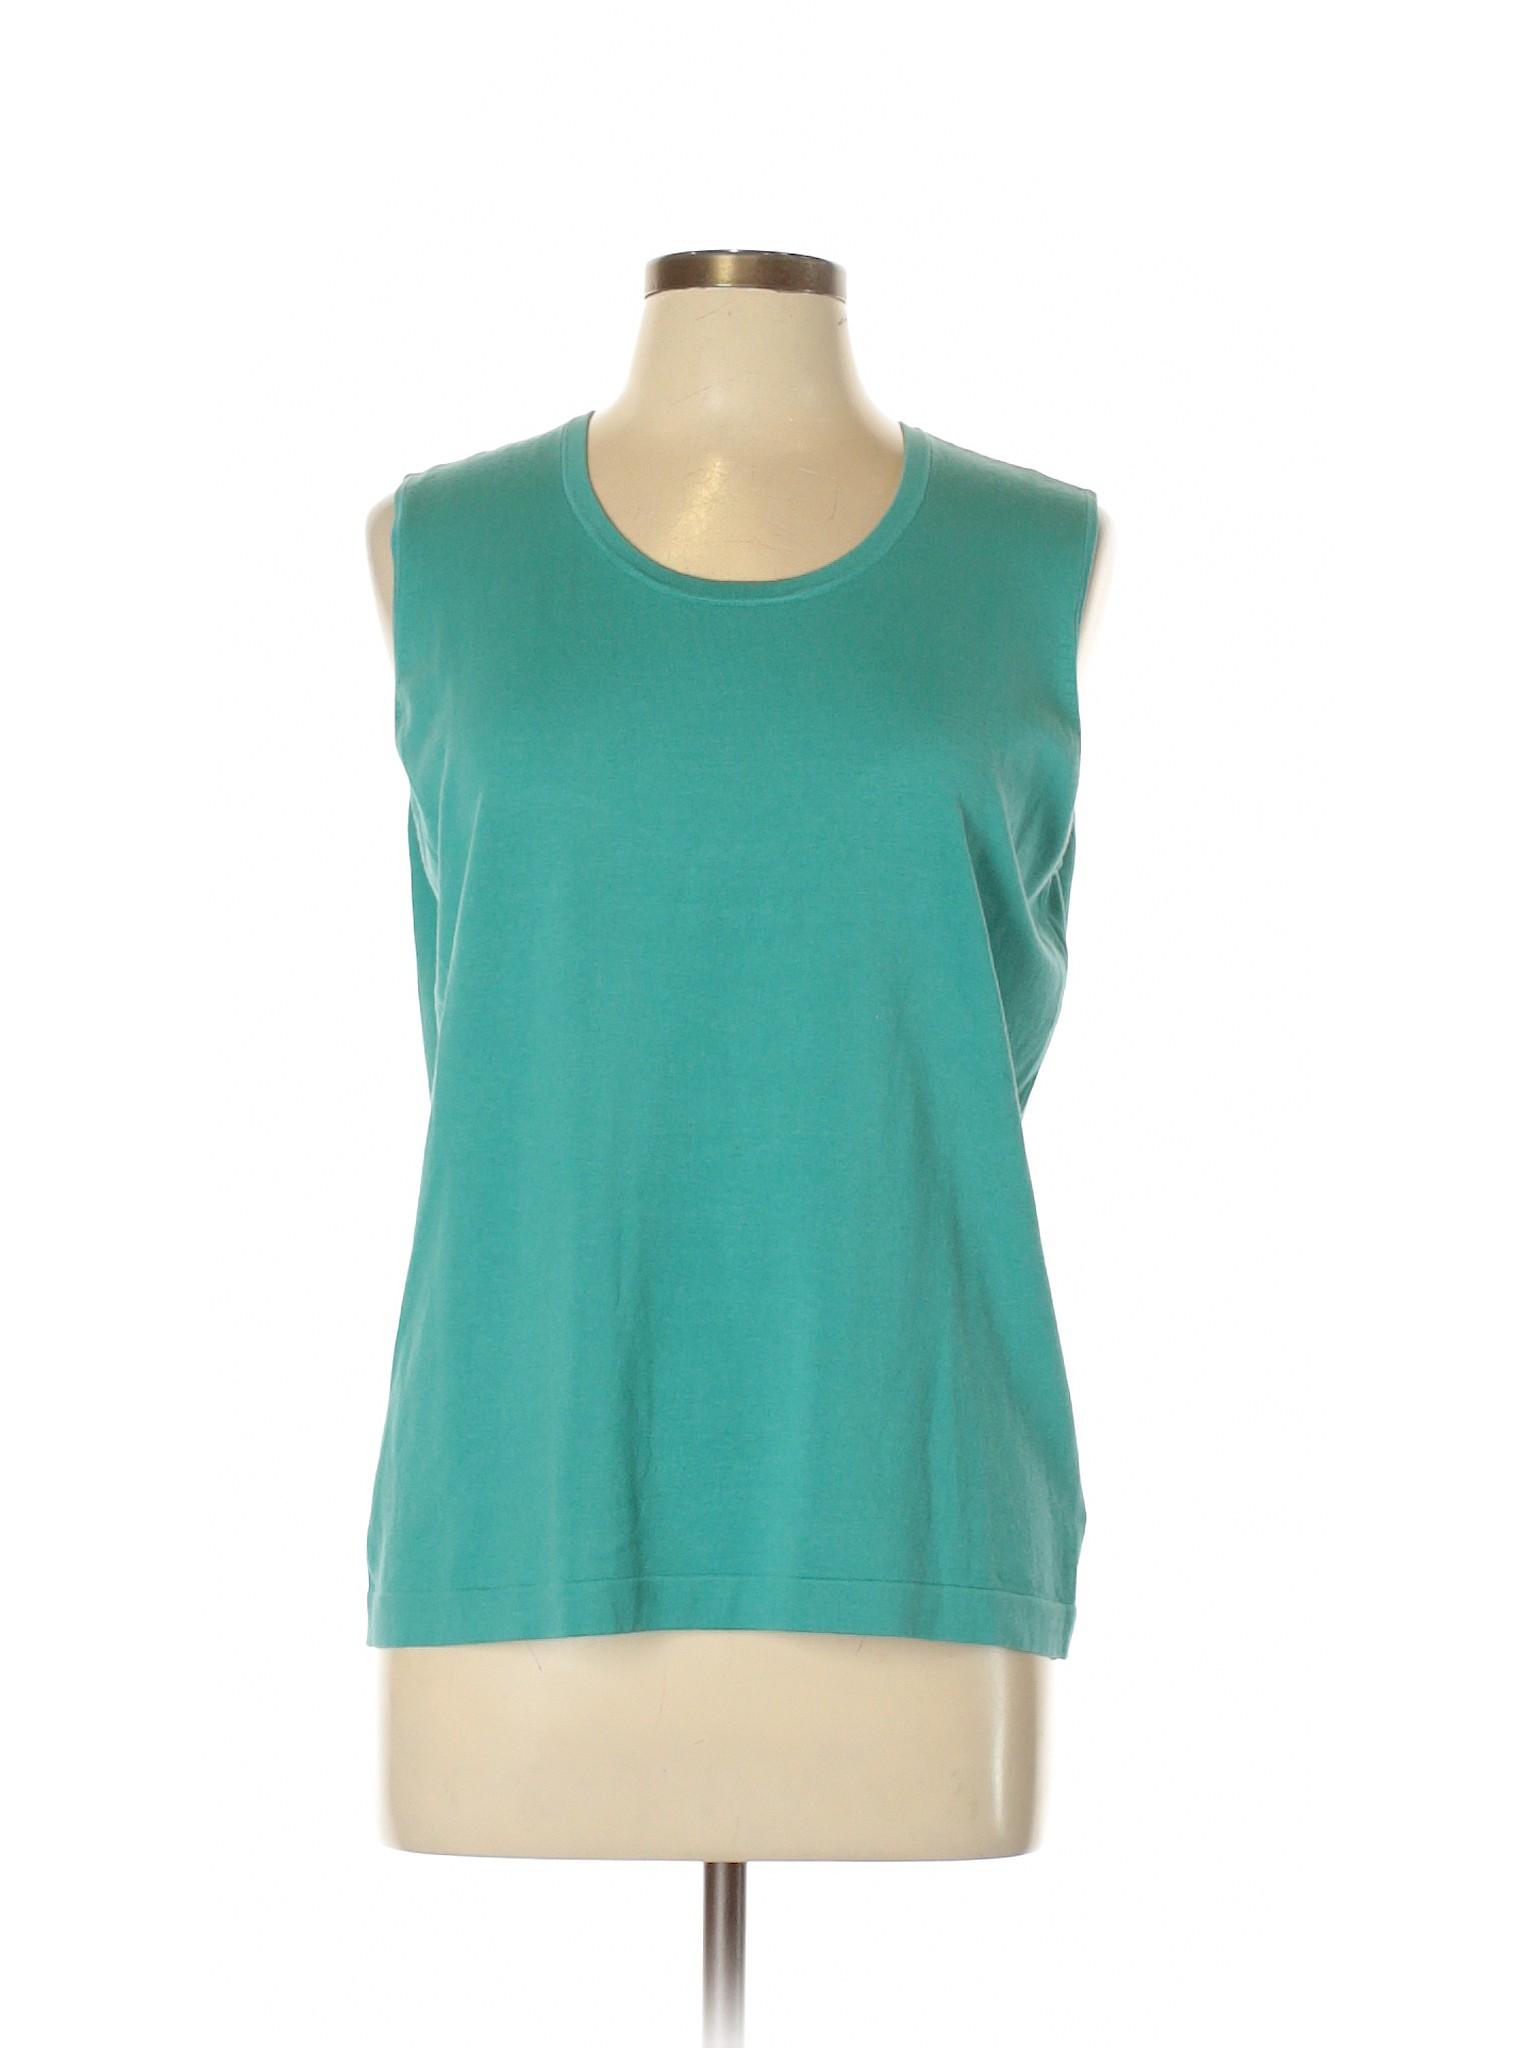 New York winter Jones Pullover Silk Sweater Collection Boutique vwE6qv